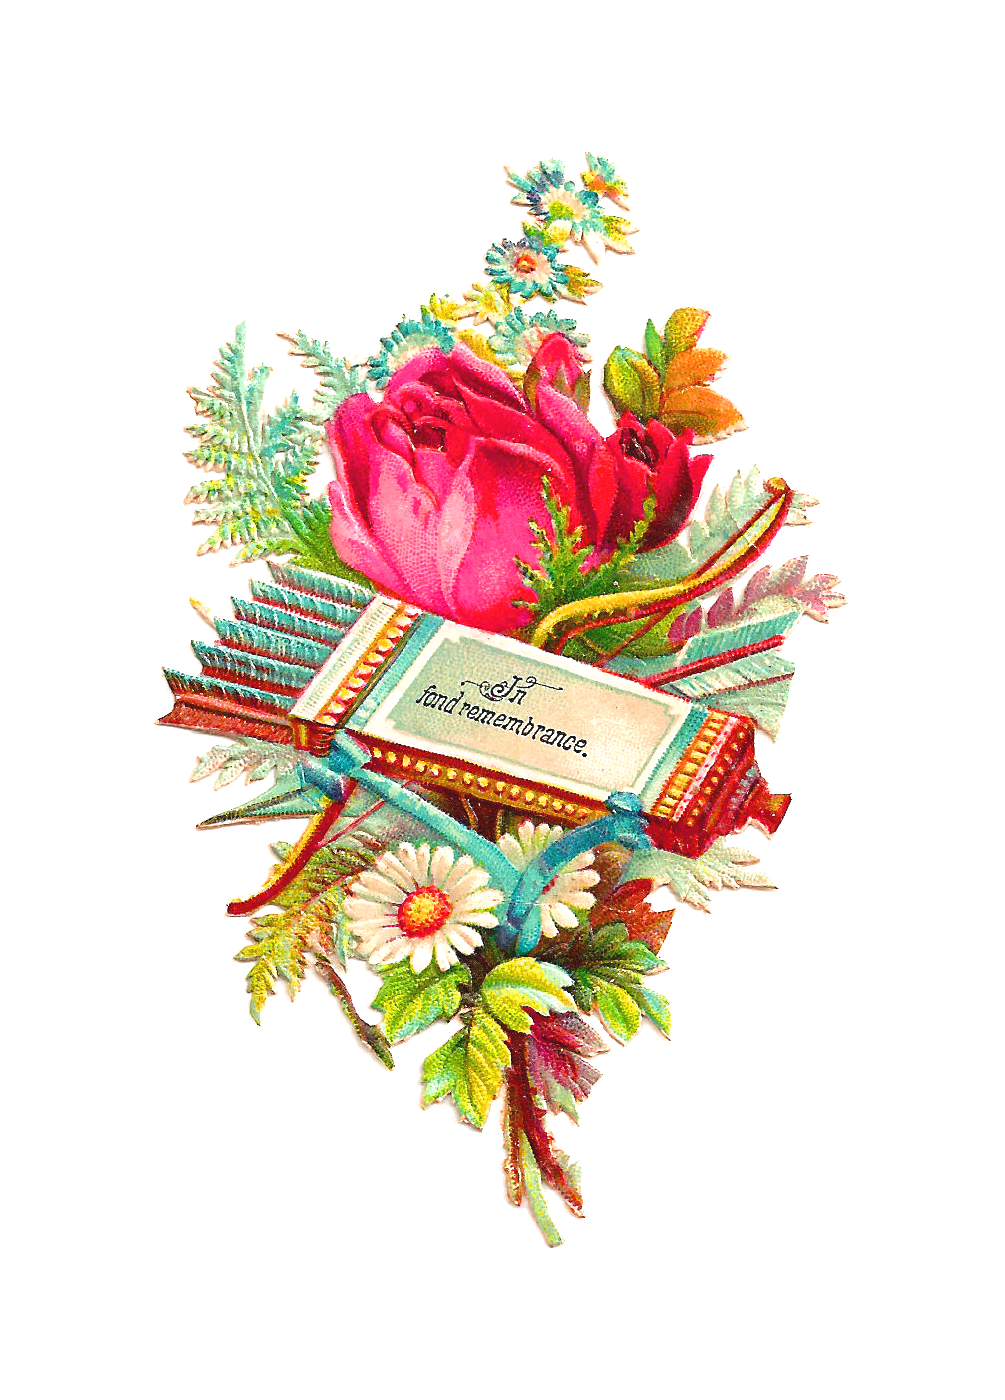 Flower arrow clipart banner library download Antique Images: Free Flower Clip Art: Antique Rose Graphic on ... banner library download